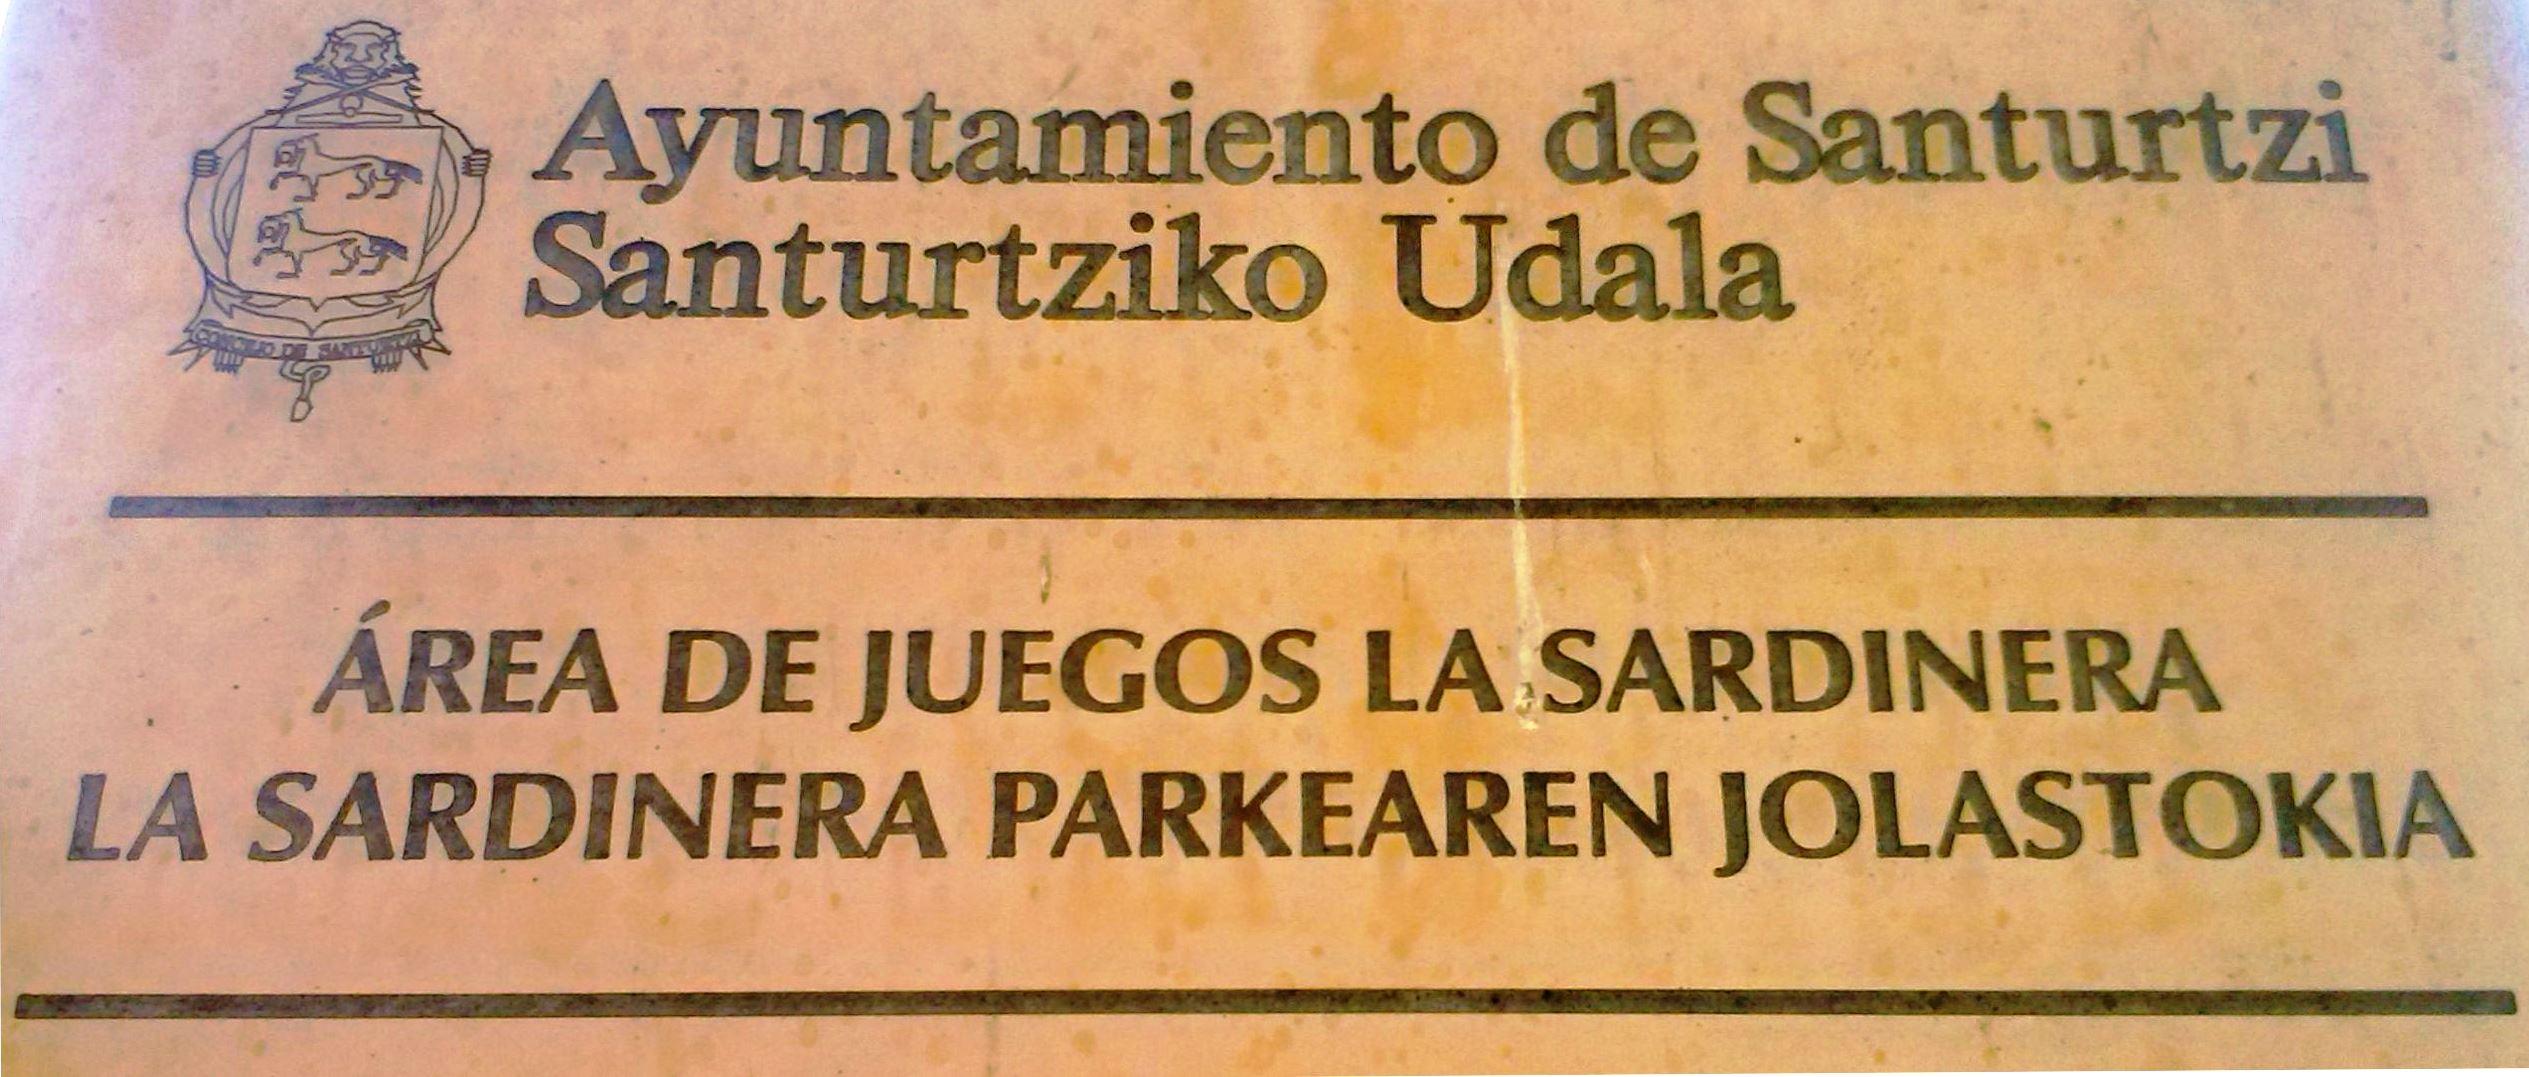 1 Parque La Sardinera-1